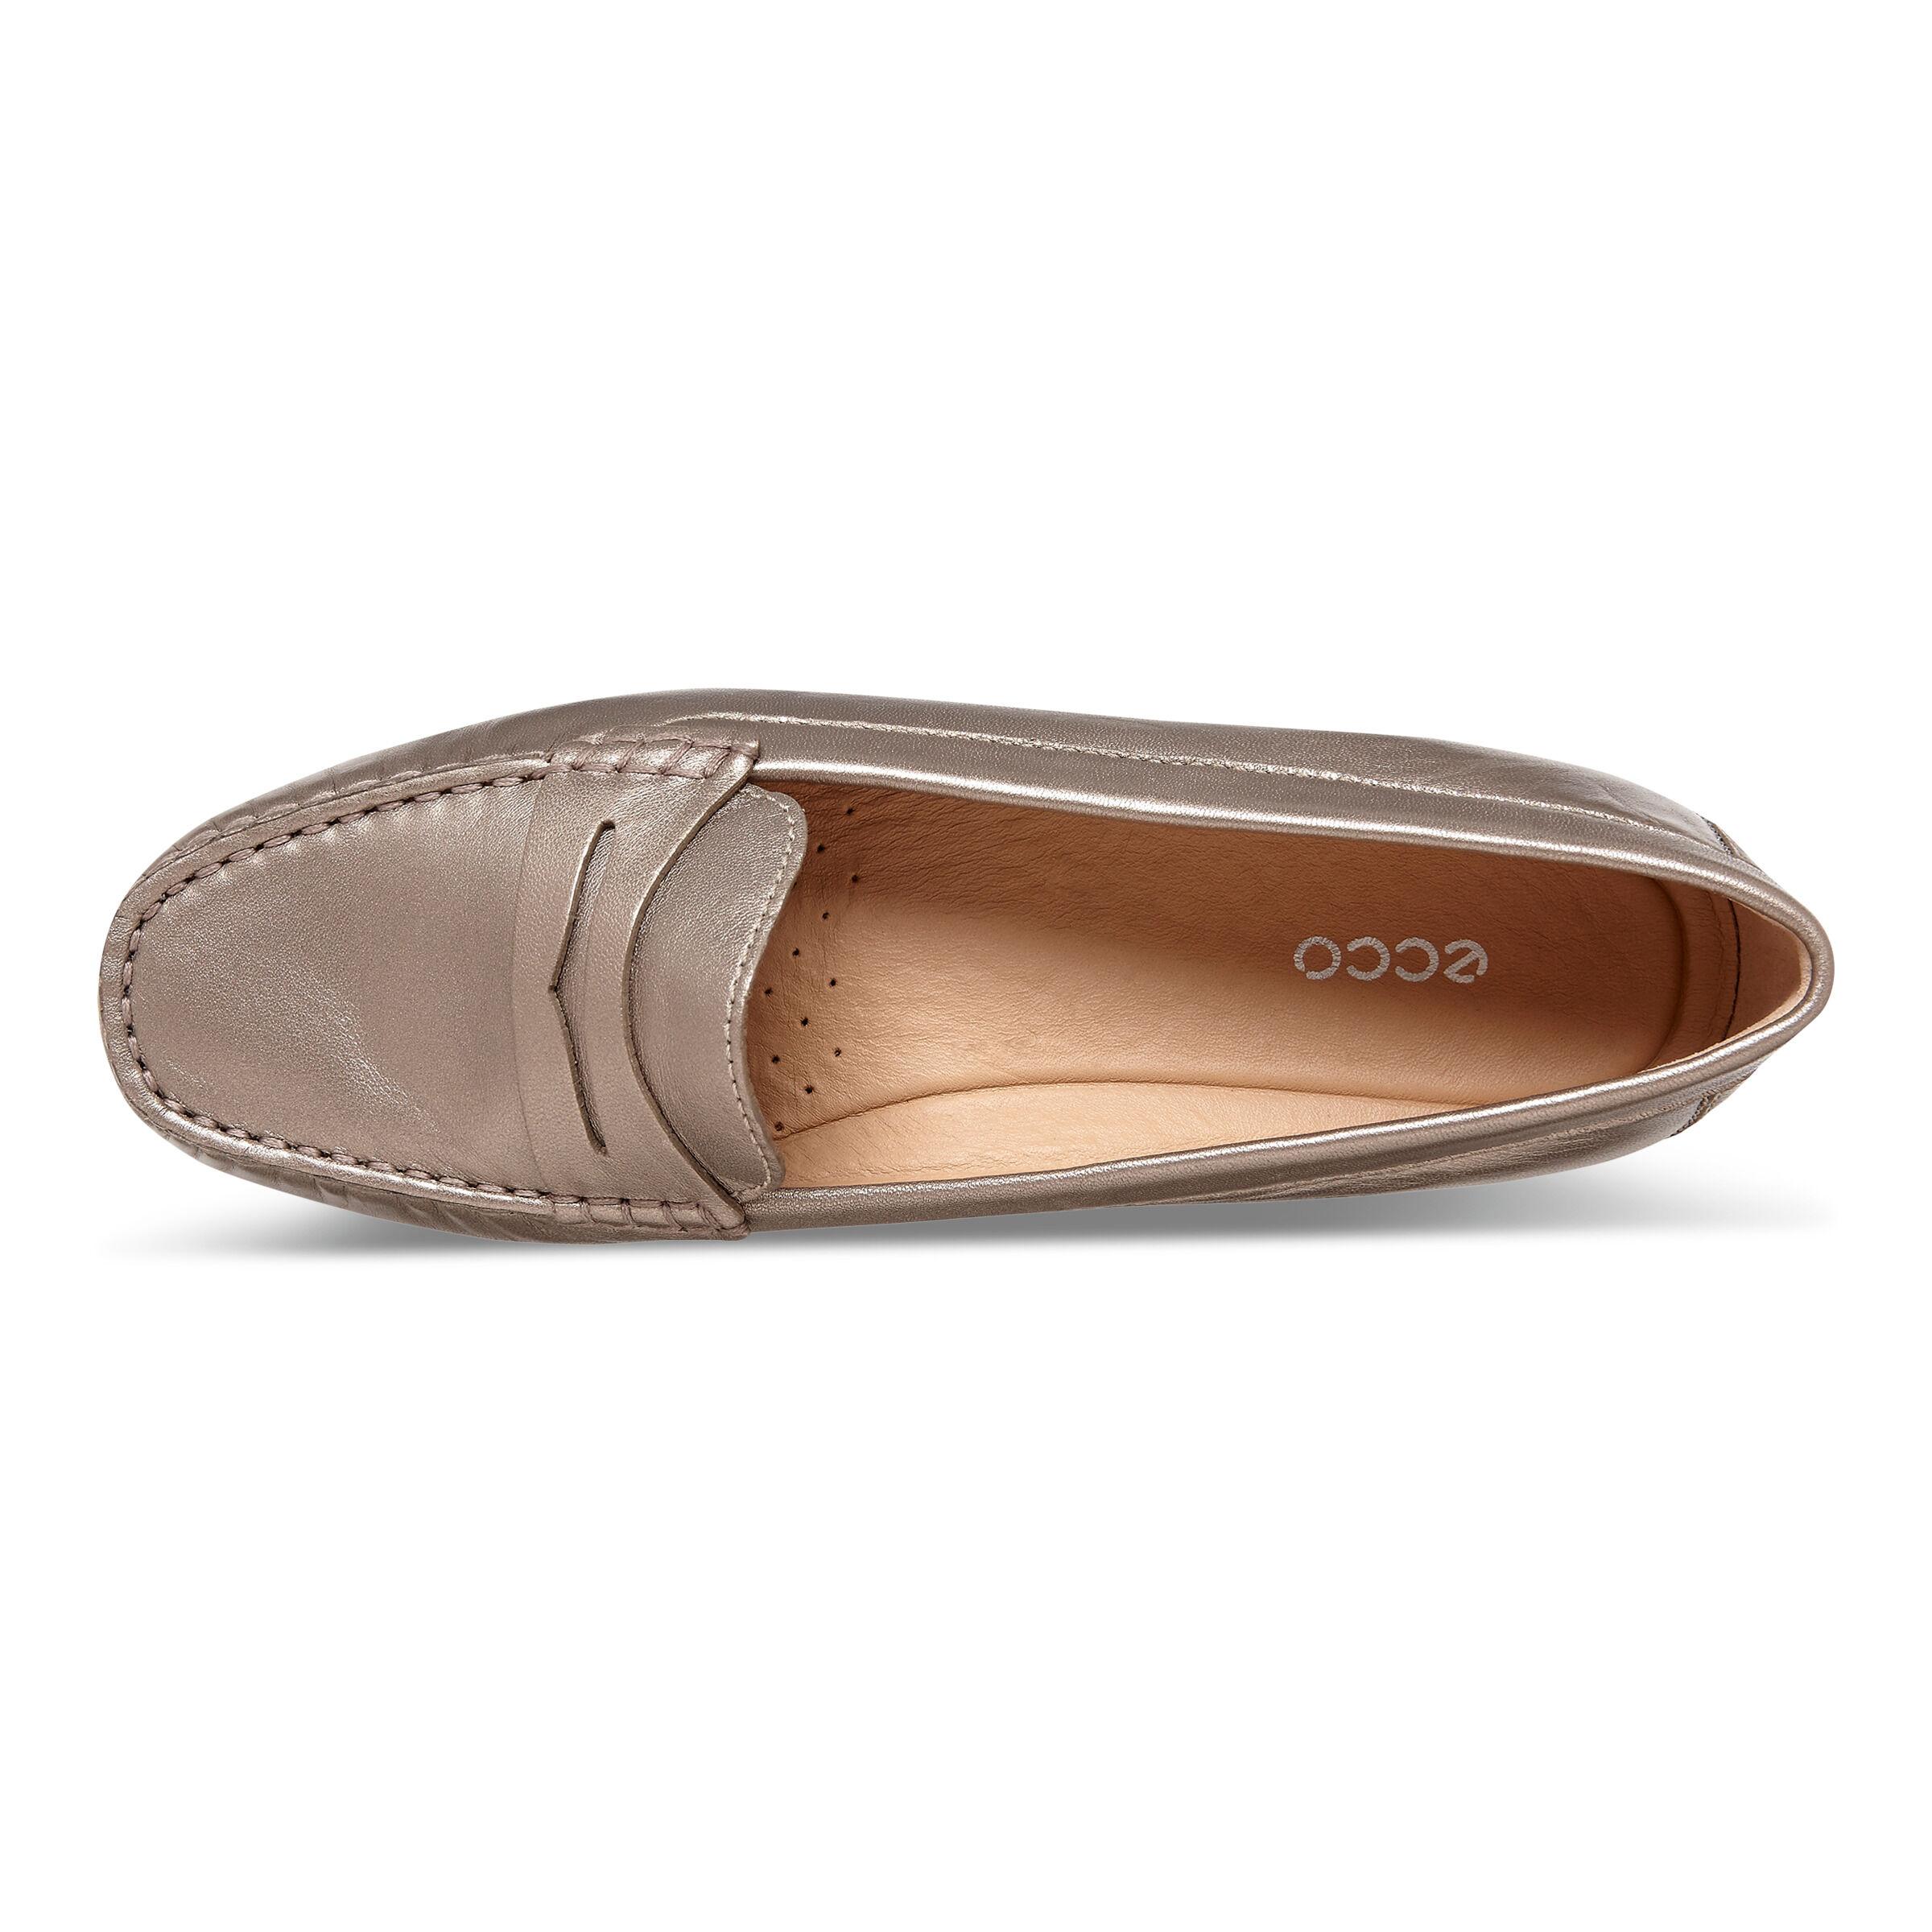 size 40 8ee74 2fd57 Schuhe & Handtaschen Slipper & Mokassins ECCO Damen Devine ...